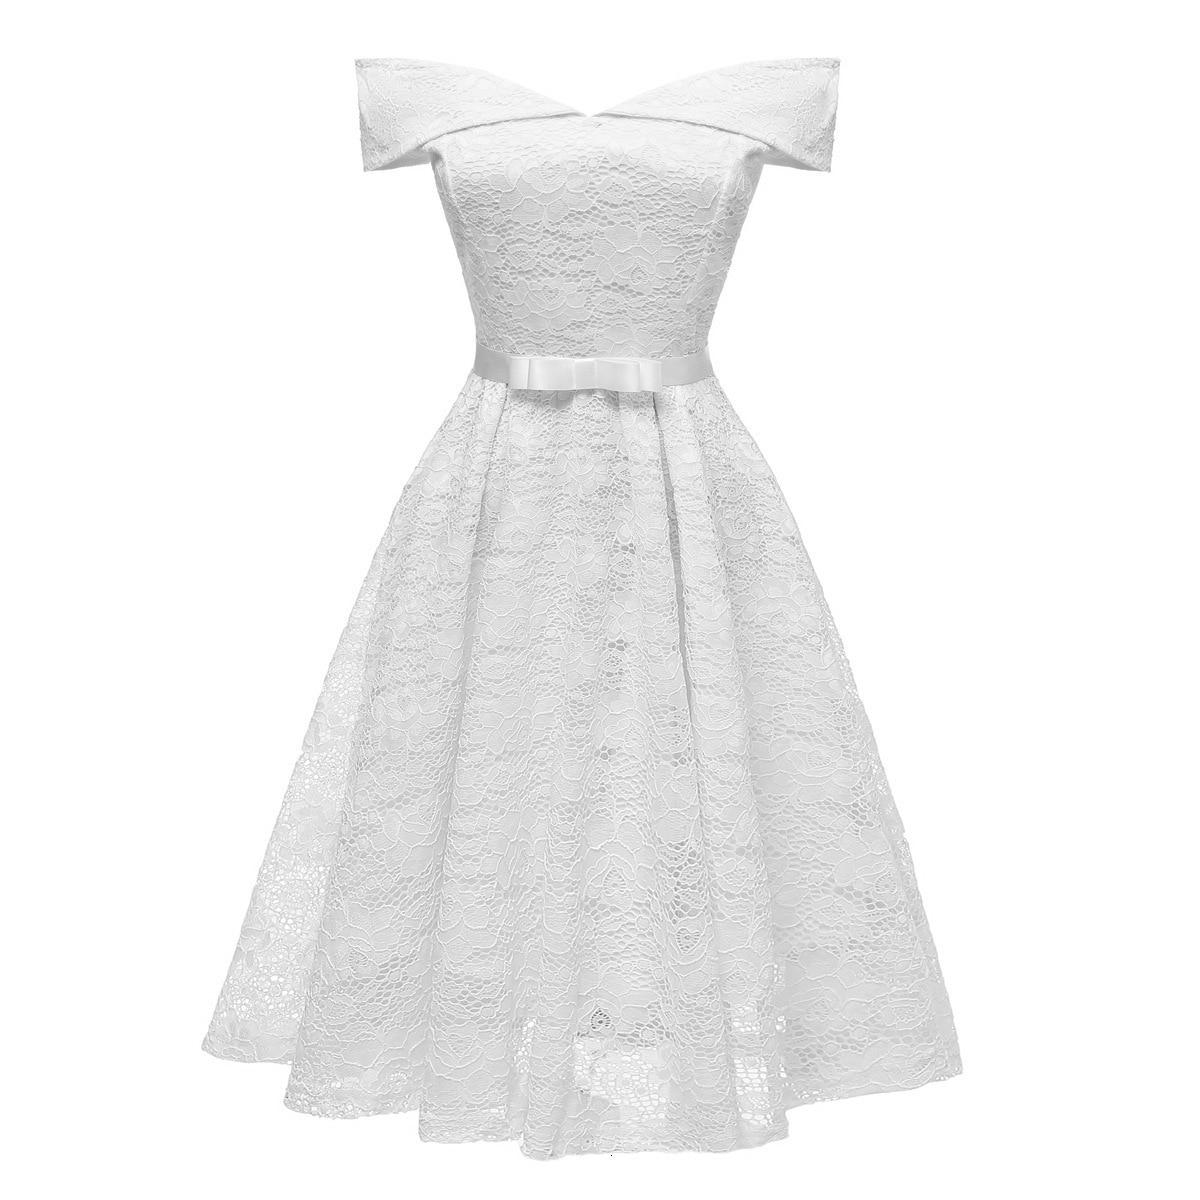 A-Line V Neck Off Shoulder Lace Knee-length Lace Bridesmaid Dress 2